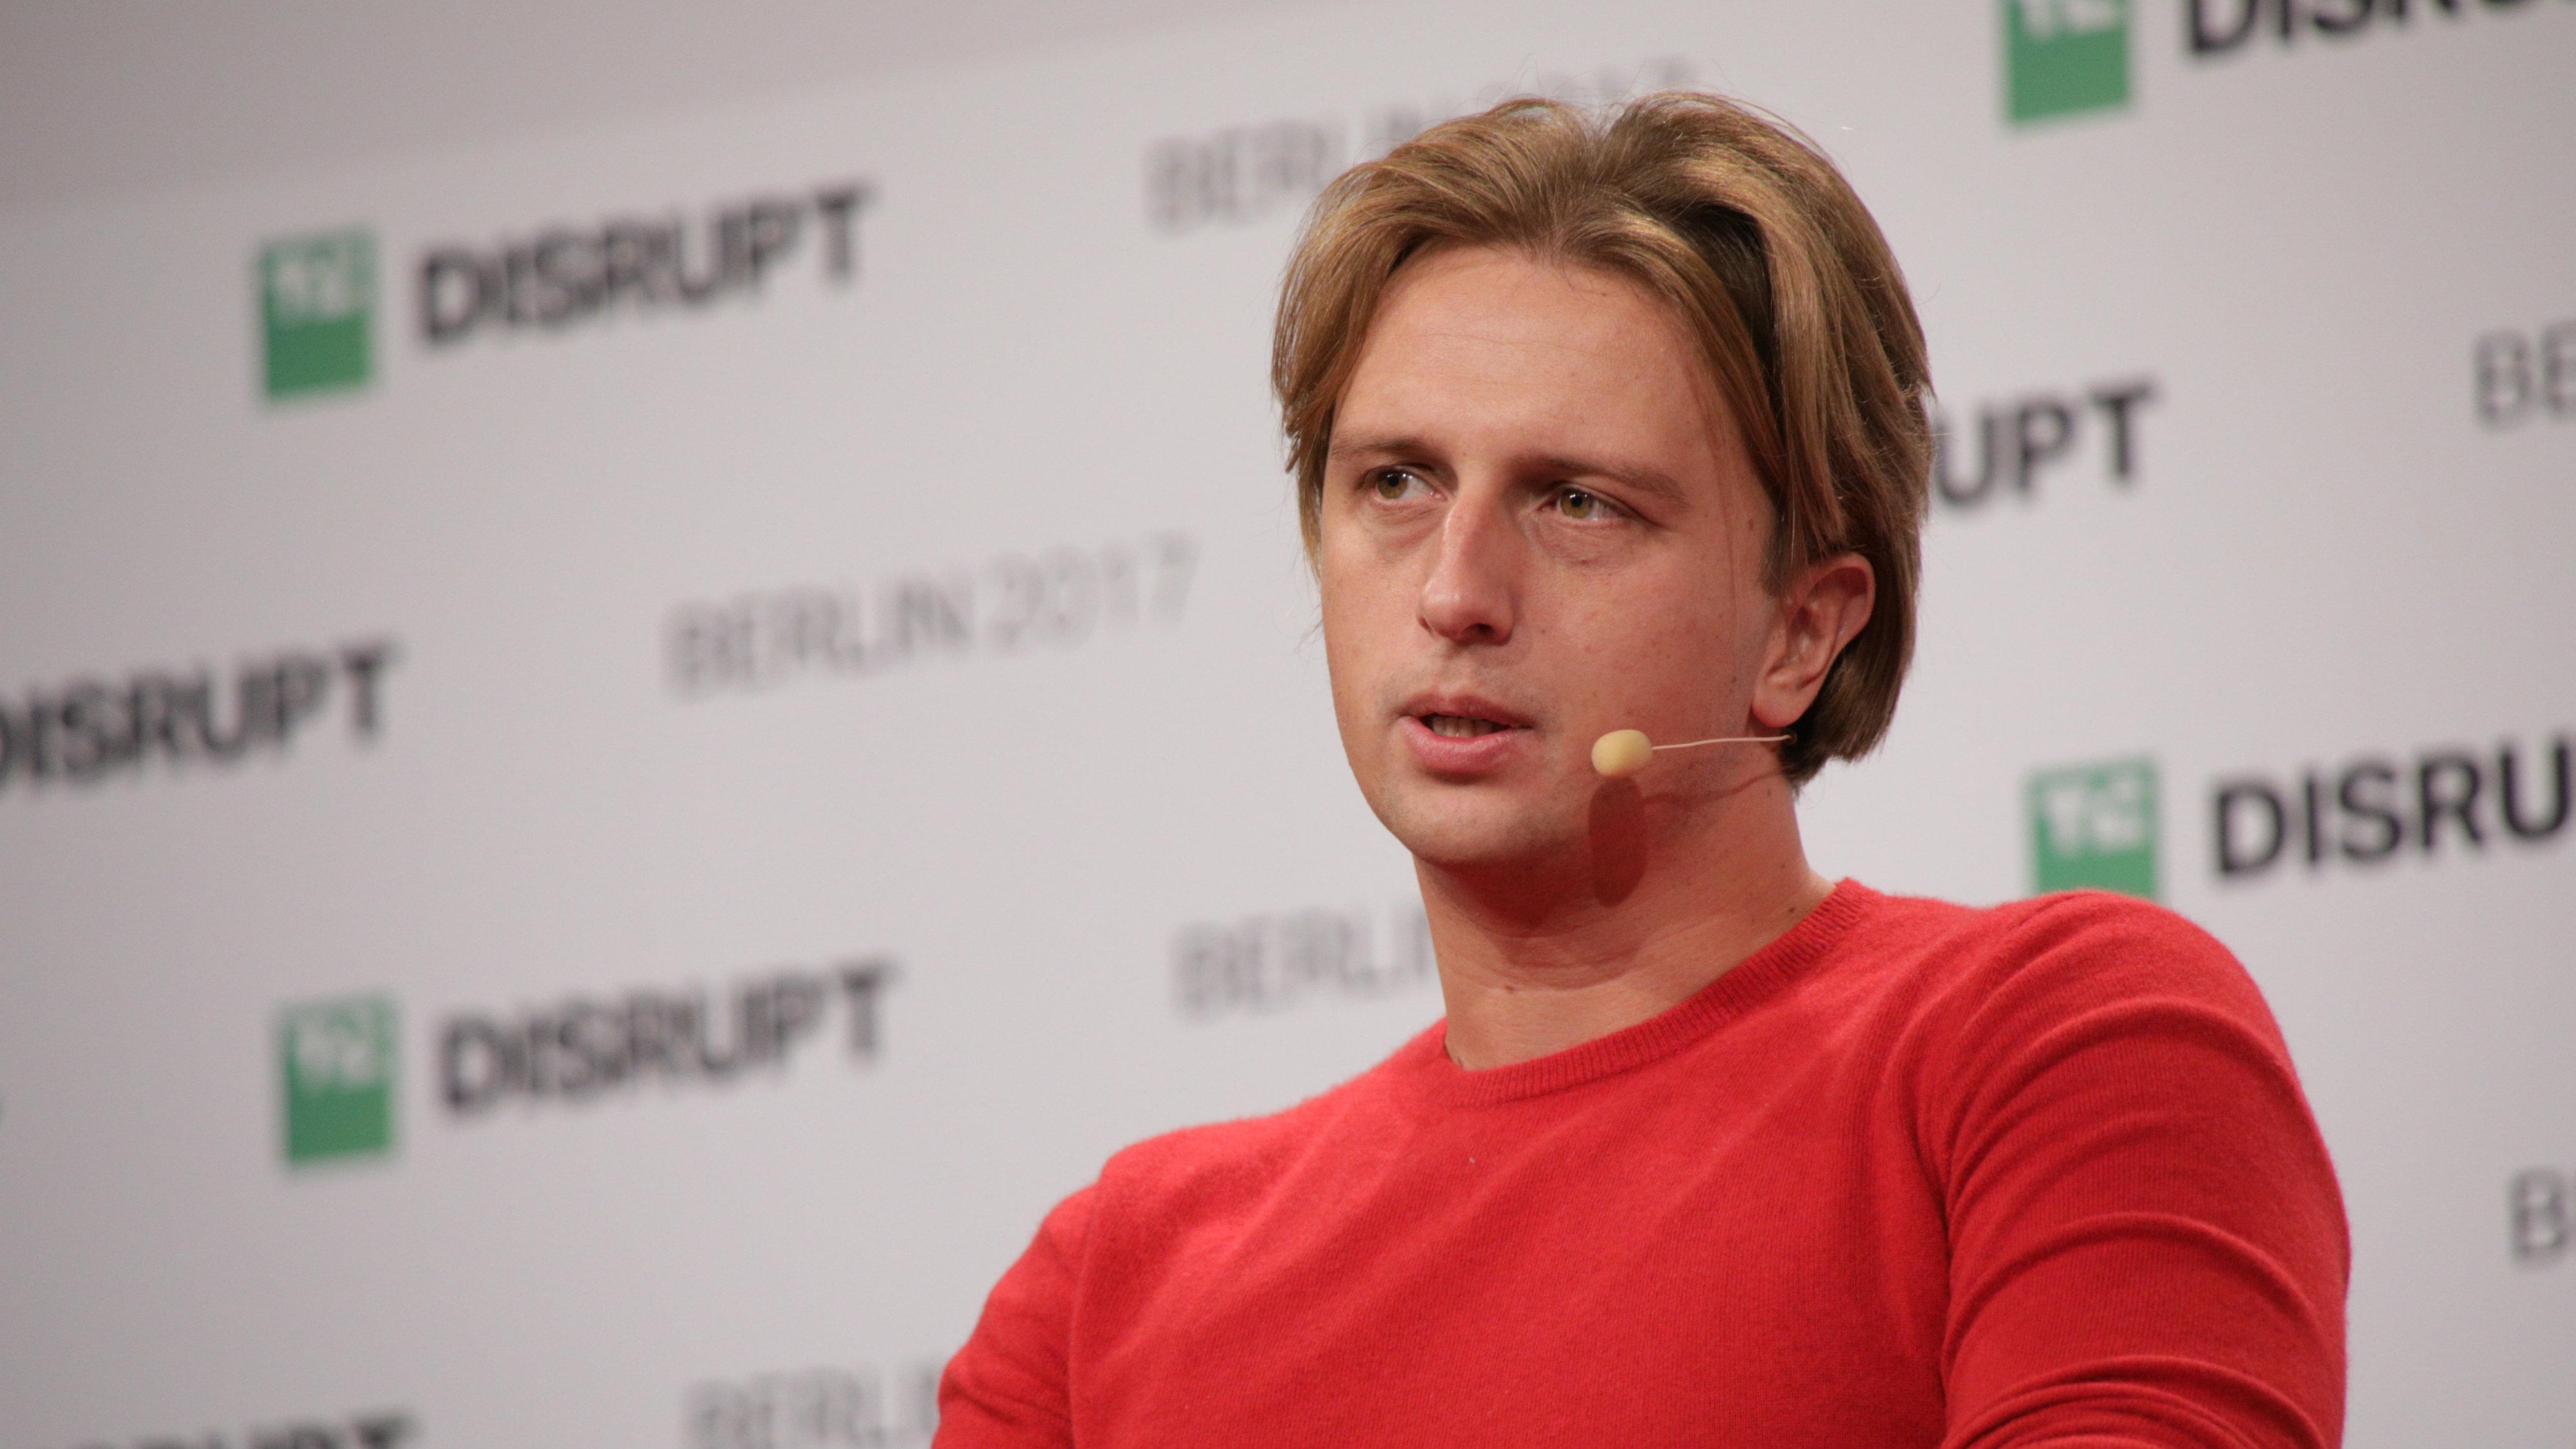 Revolut CEO Storonsky